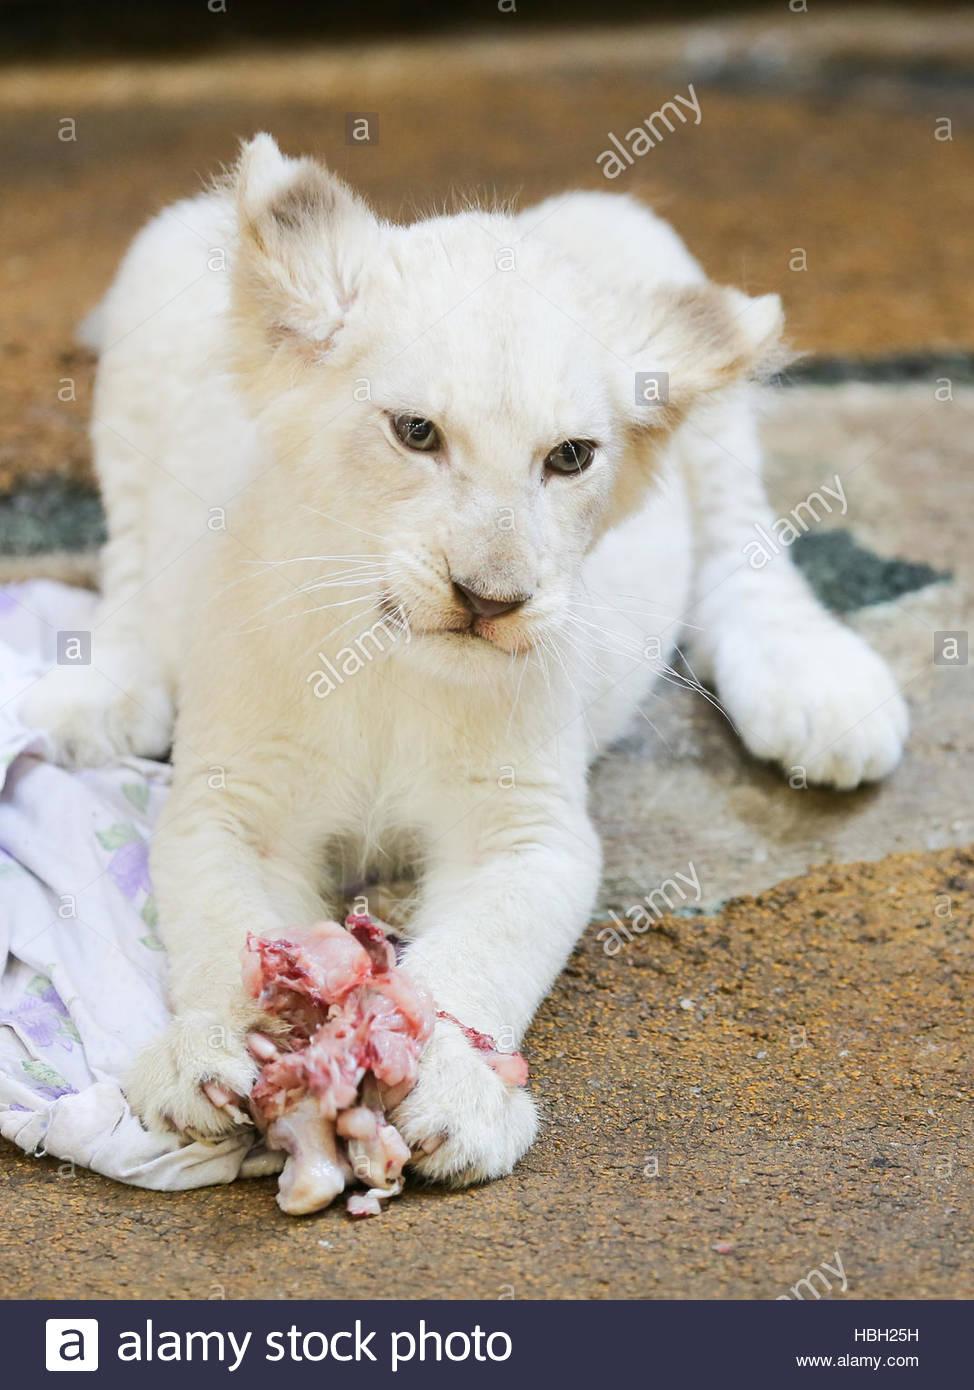 Zoologischer Garten Magdeburg Neu White Female Lion Cub In Zoo Magdeburg Stock